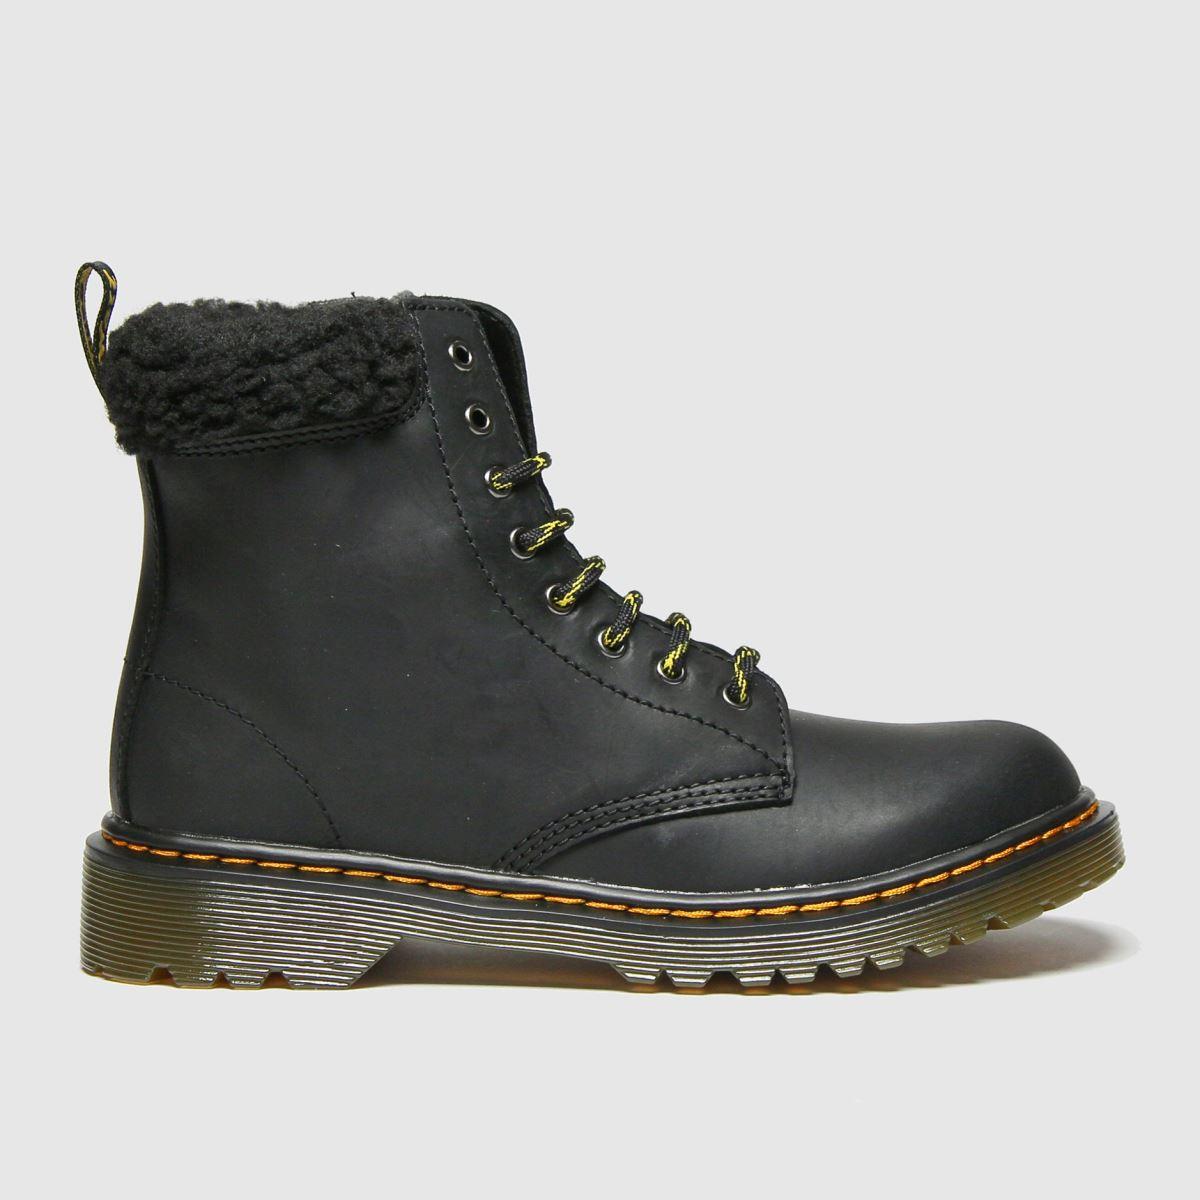 Dr Martens Black 1460 Collar Boots Junior